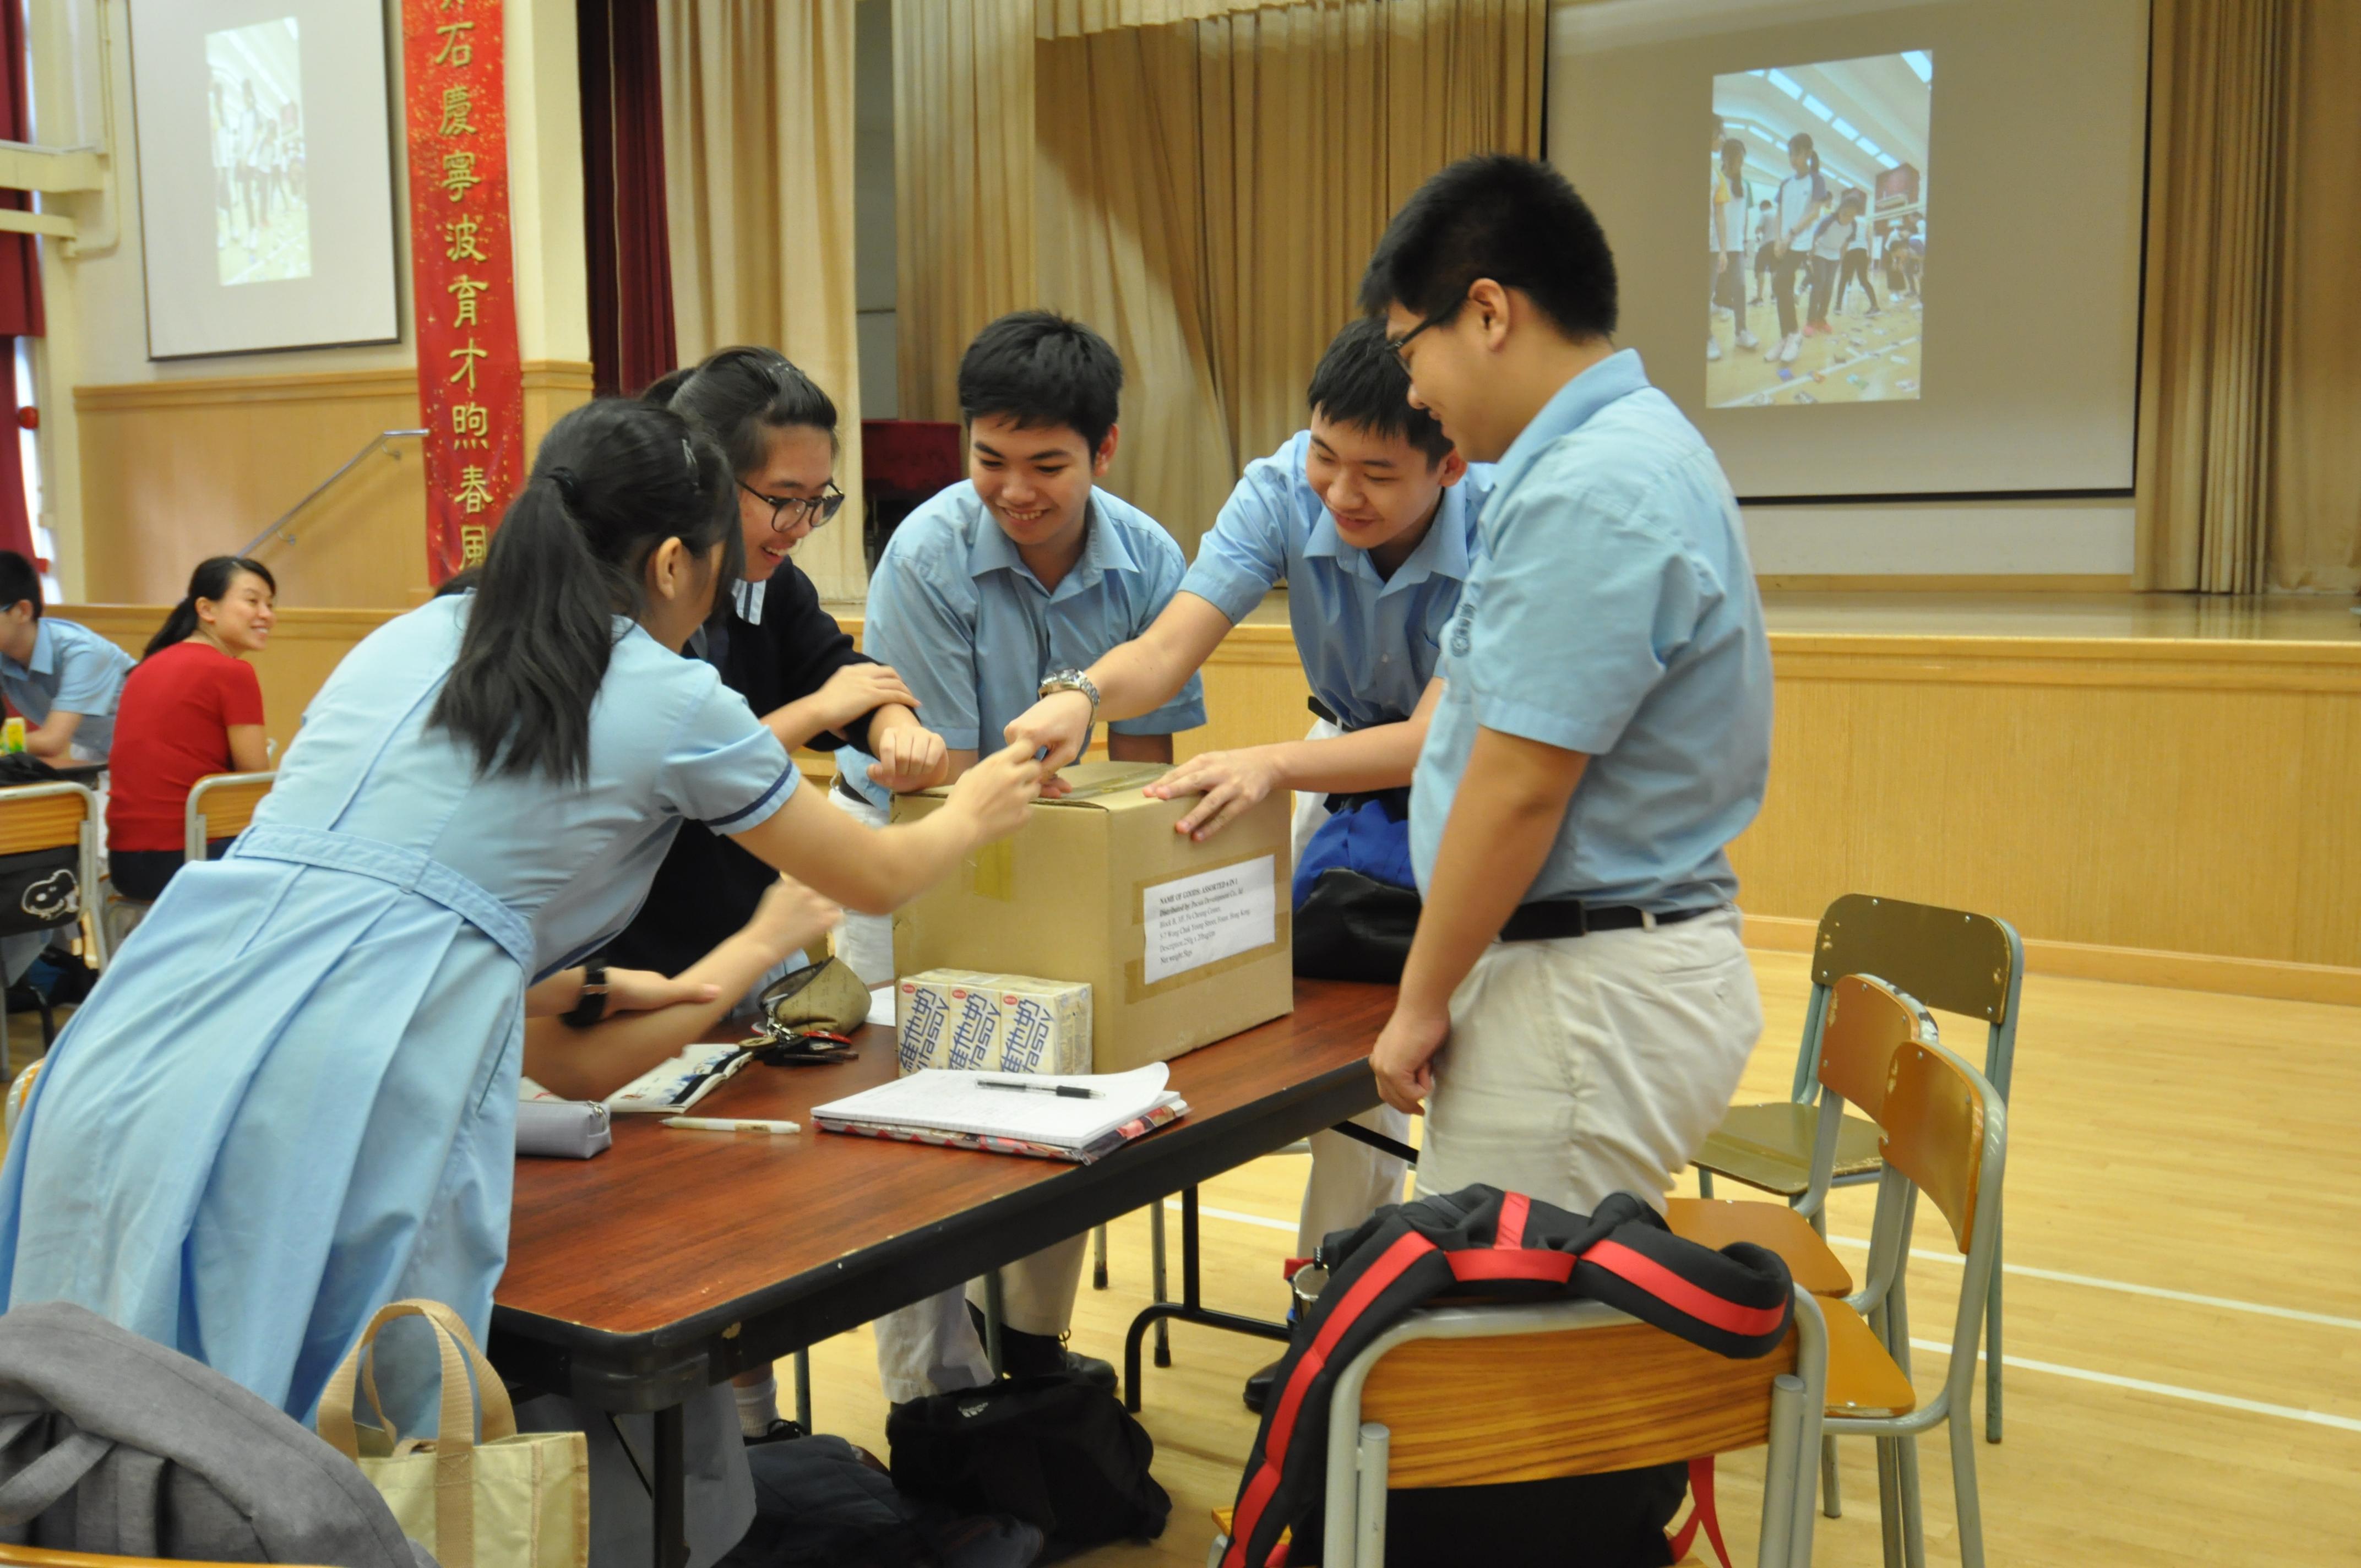 http://www.npc.edu.hk/sites/default/files/dsc_0069.jpg